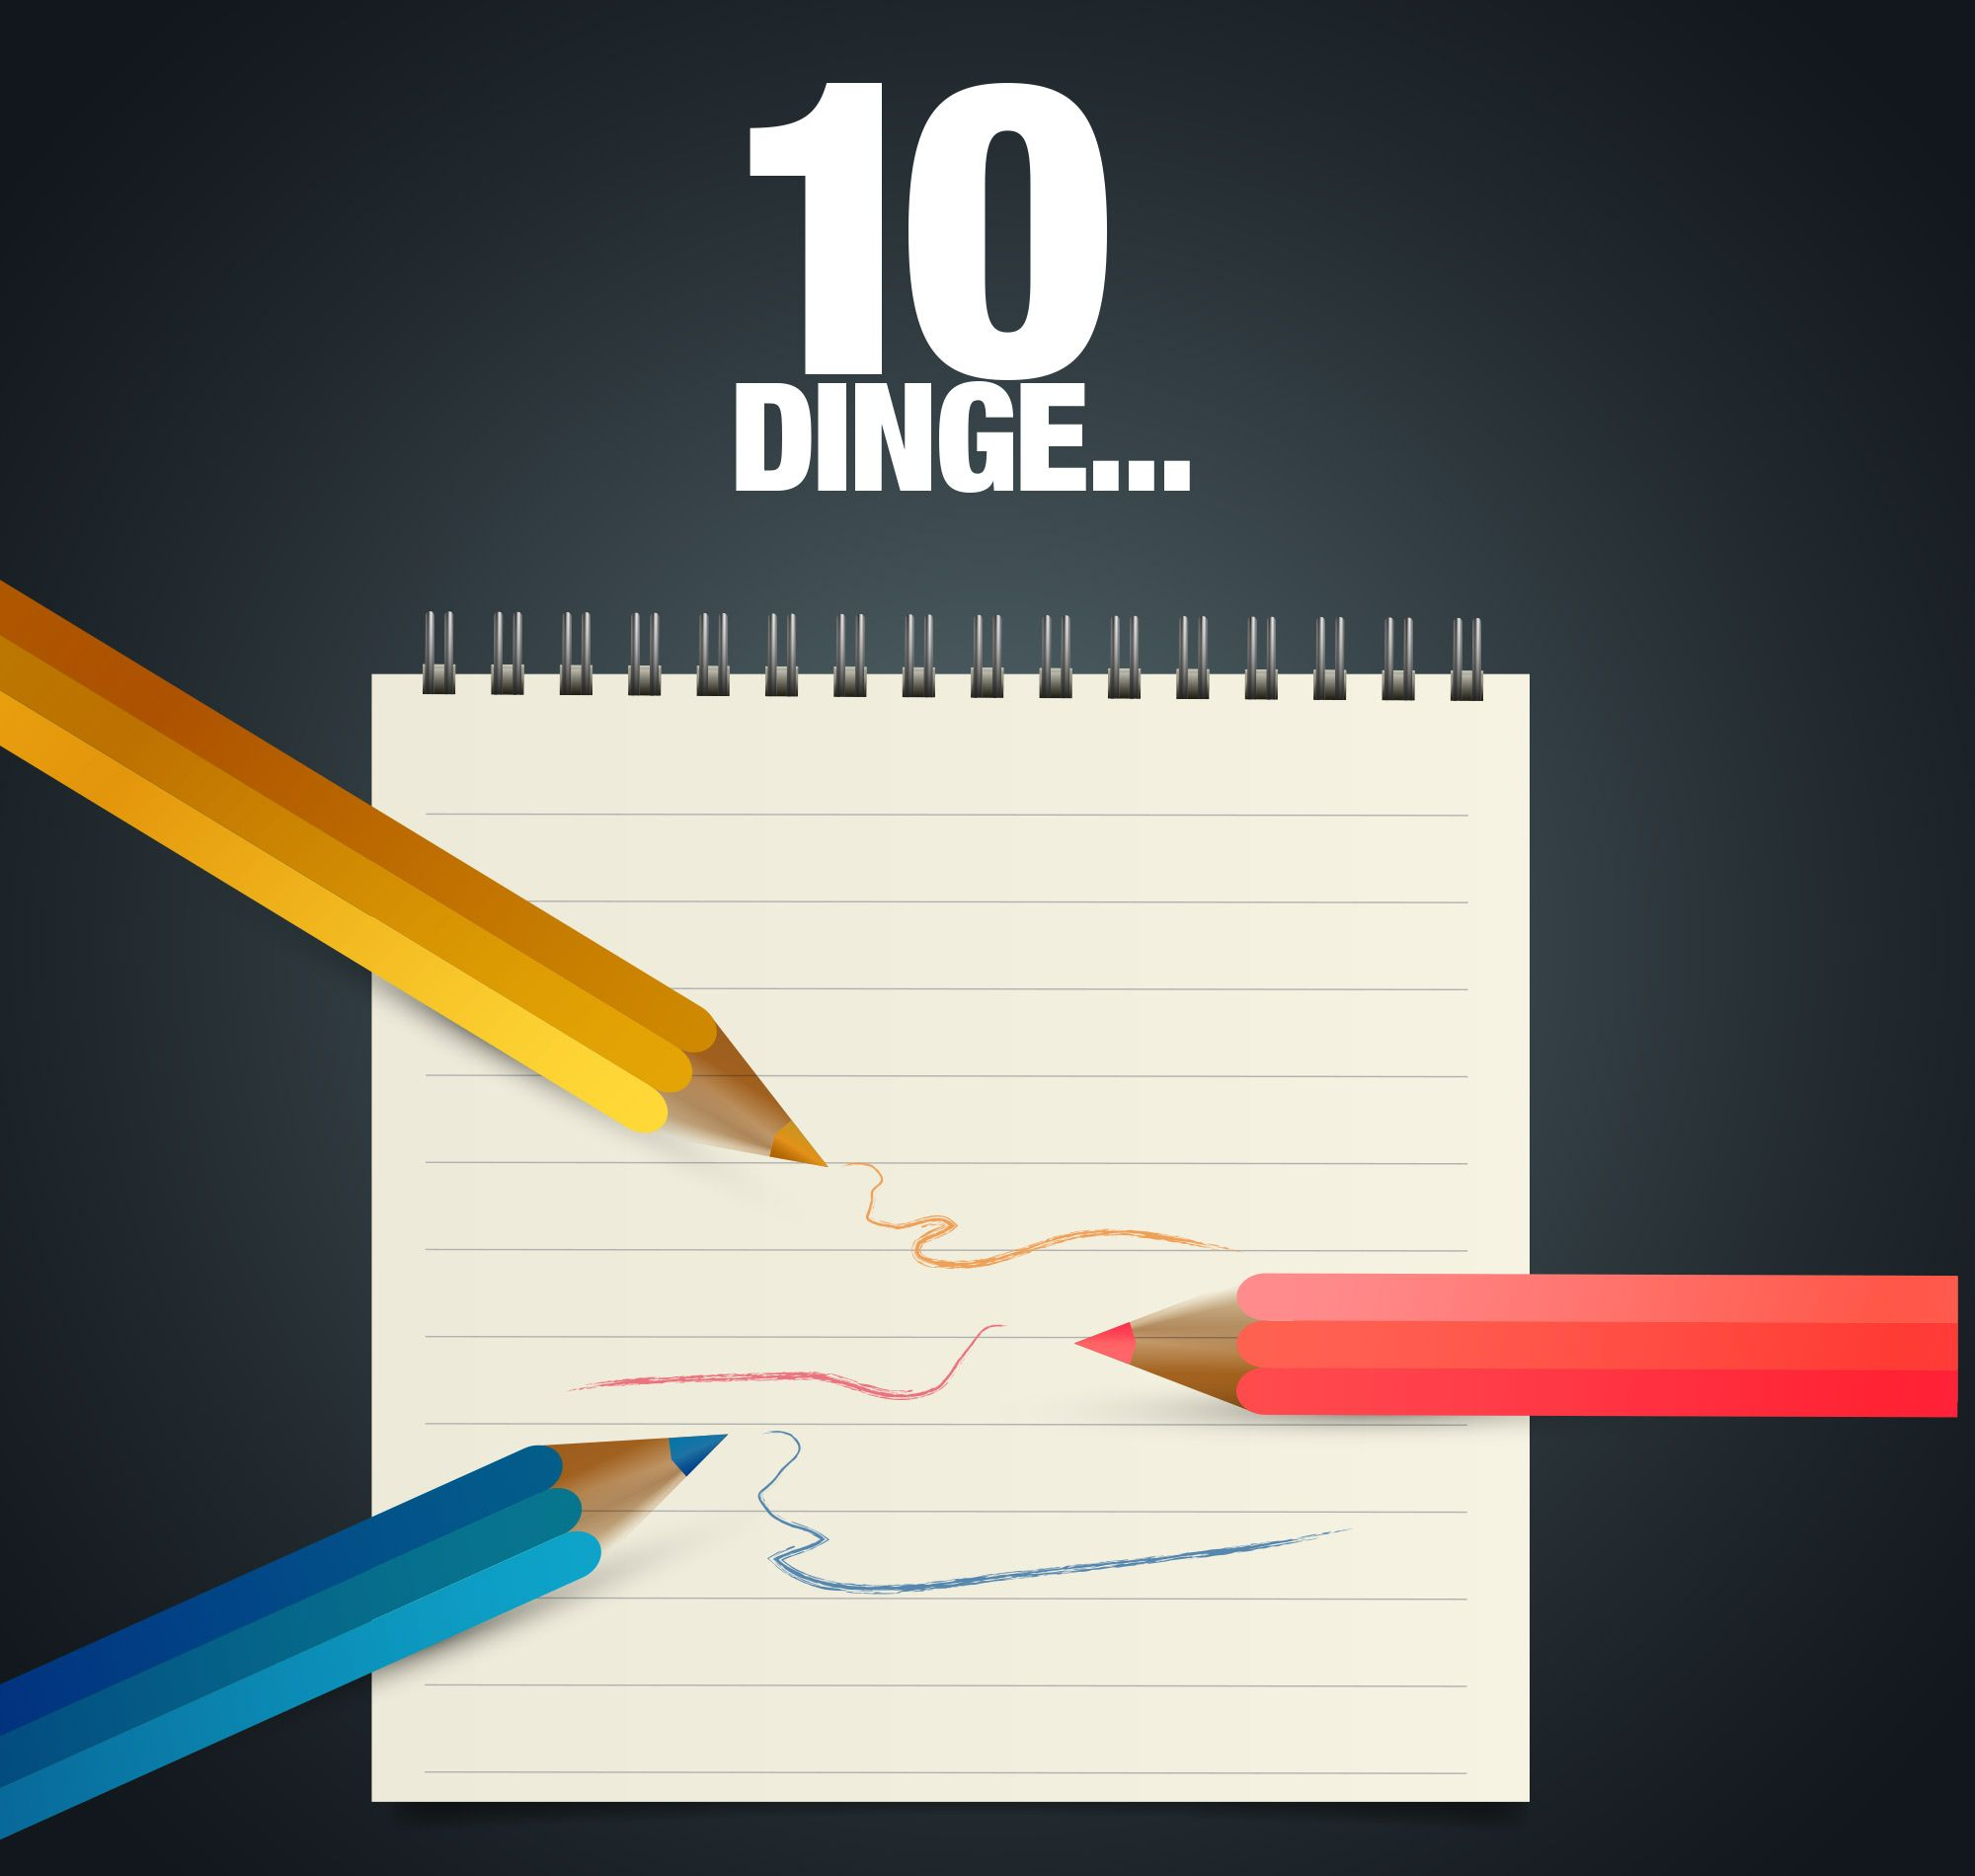 10_dinge_titelbild_blog